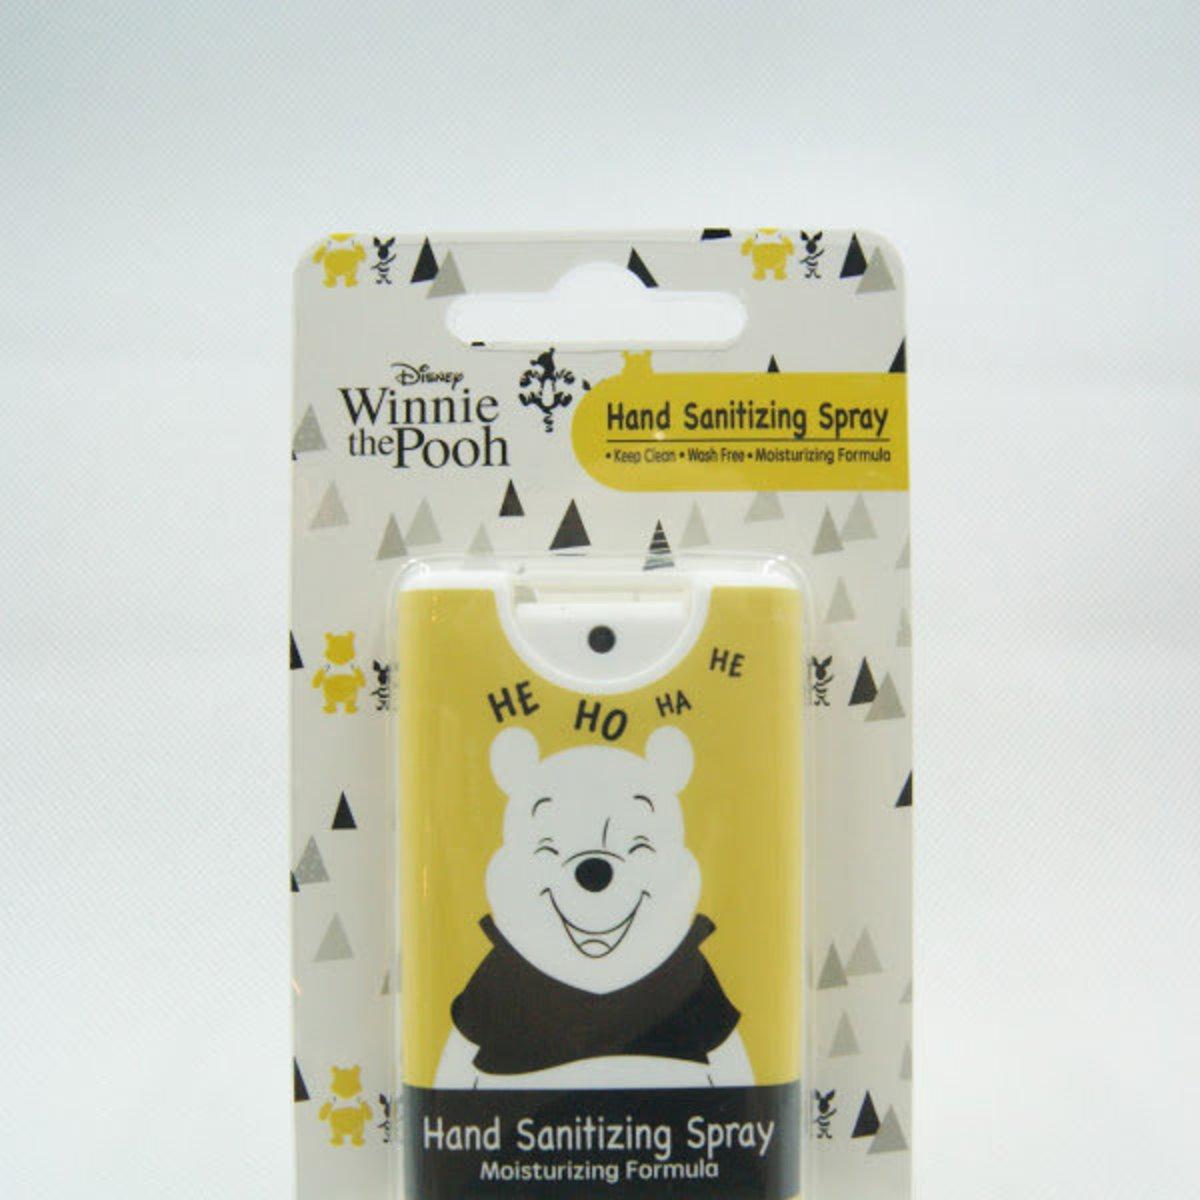 Winnie the Pooh Hand Sanitizer Spray 12ml DWP0007 x20 [Licensed by Disney]